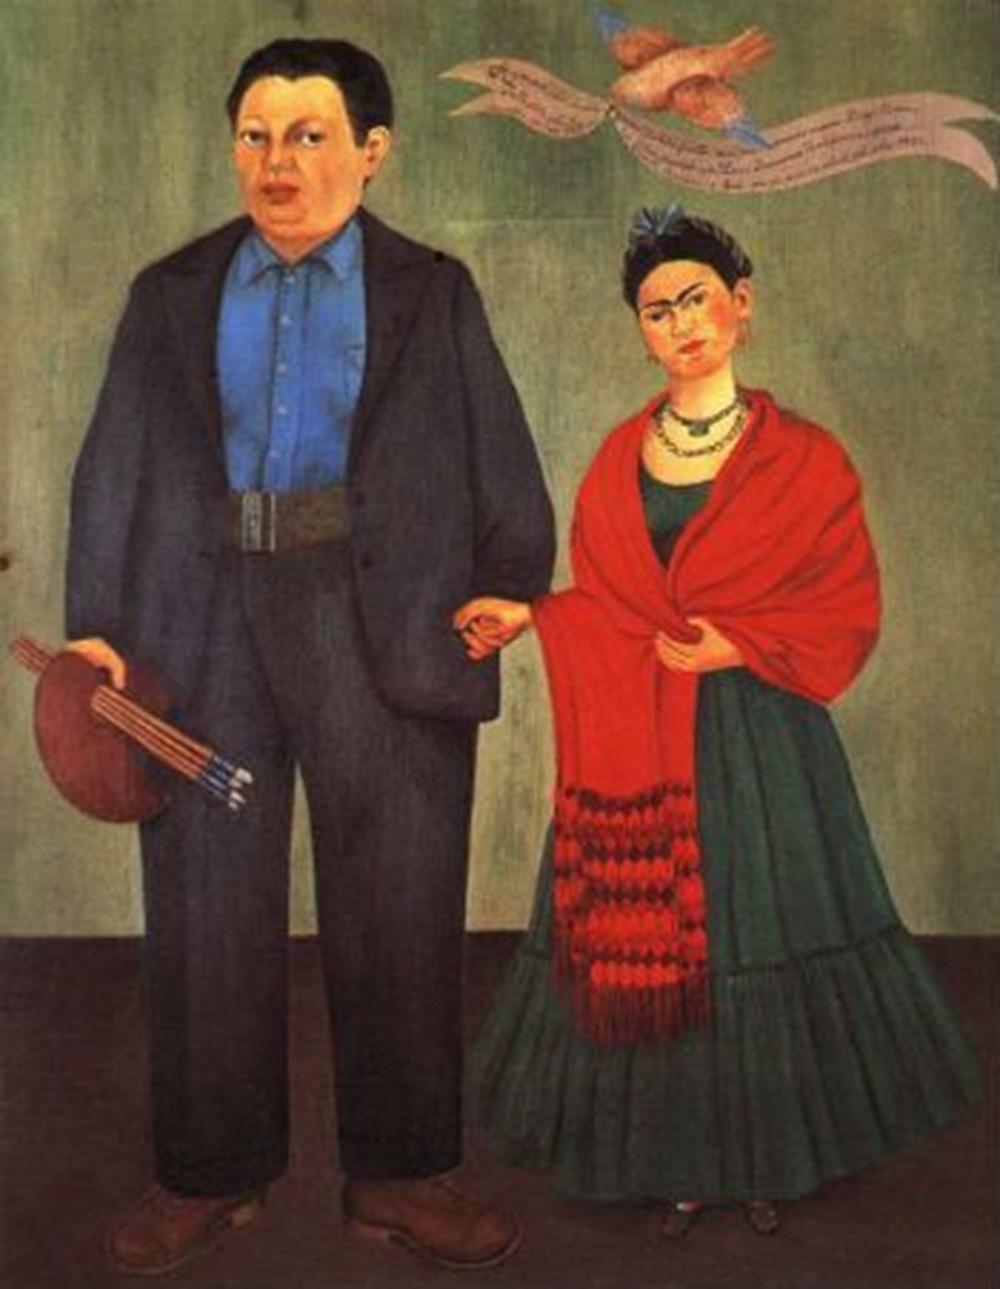 Ressam Frida Kahlo kimdir? (Tahta Bacak Frida Kahlo'nun hayatı) - 9